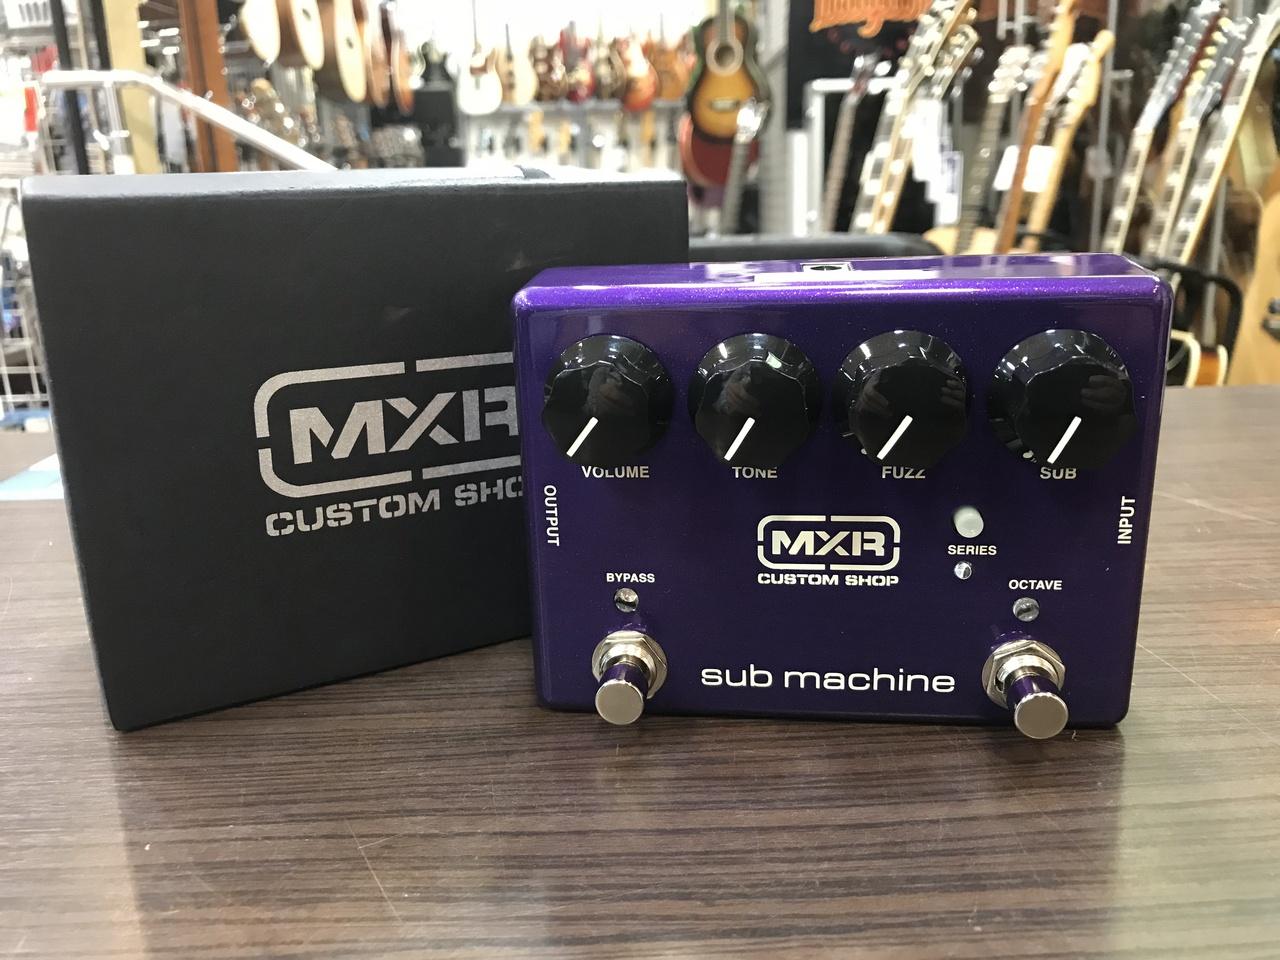 MXR Custom Shop CSP210 Sub Machine 【アウトレット特価】【ベース向けファズ】